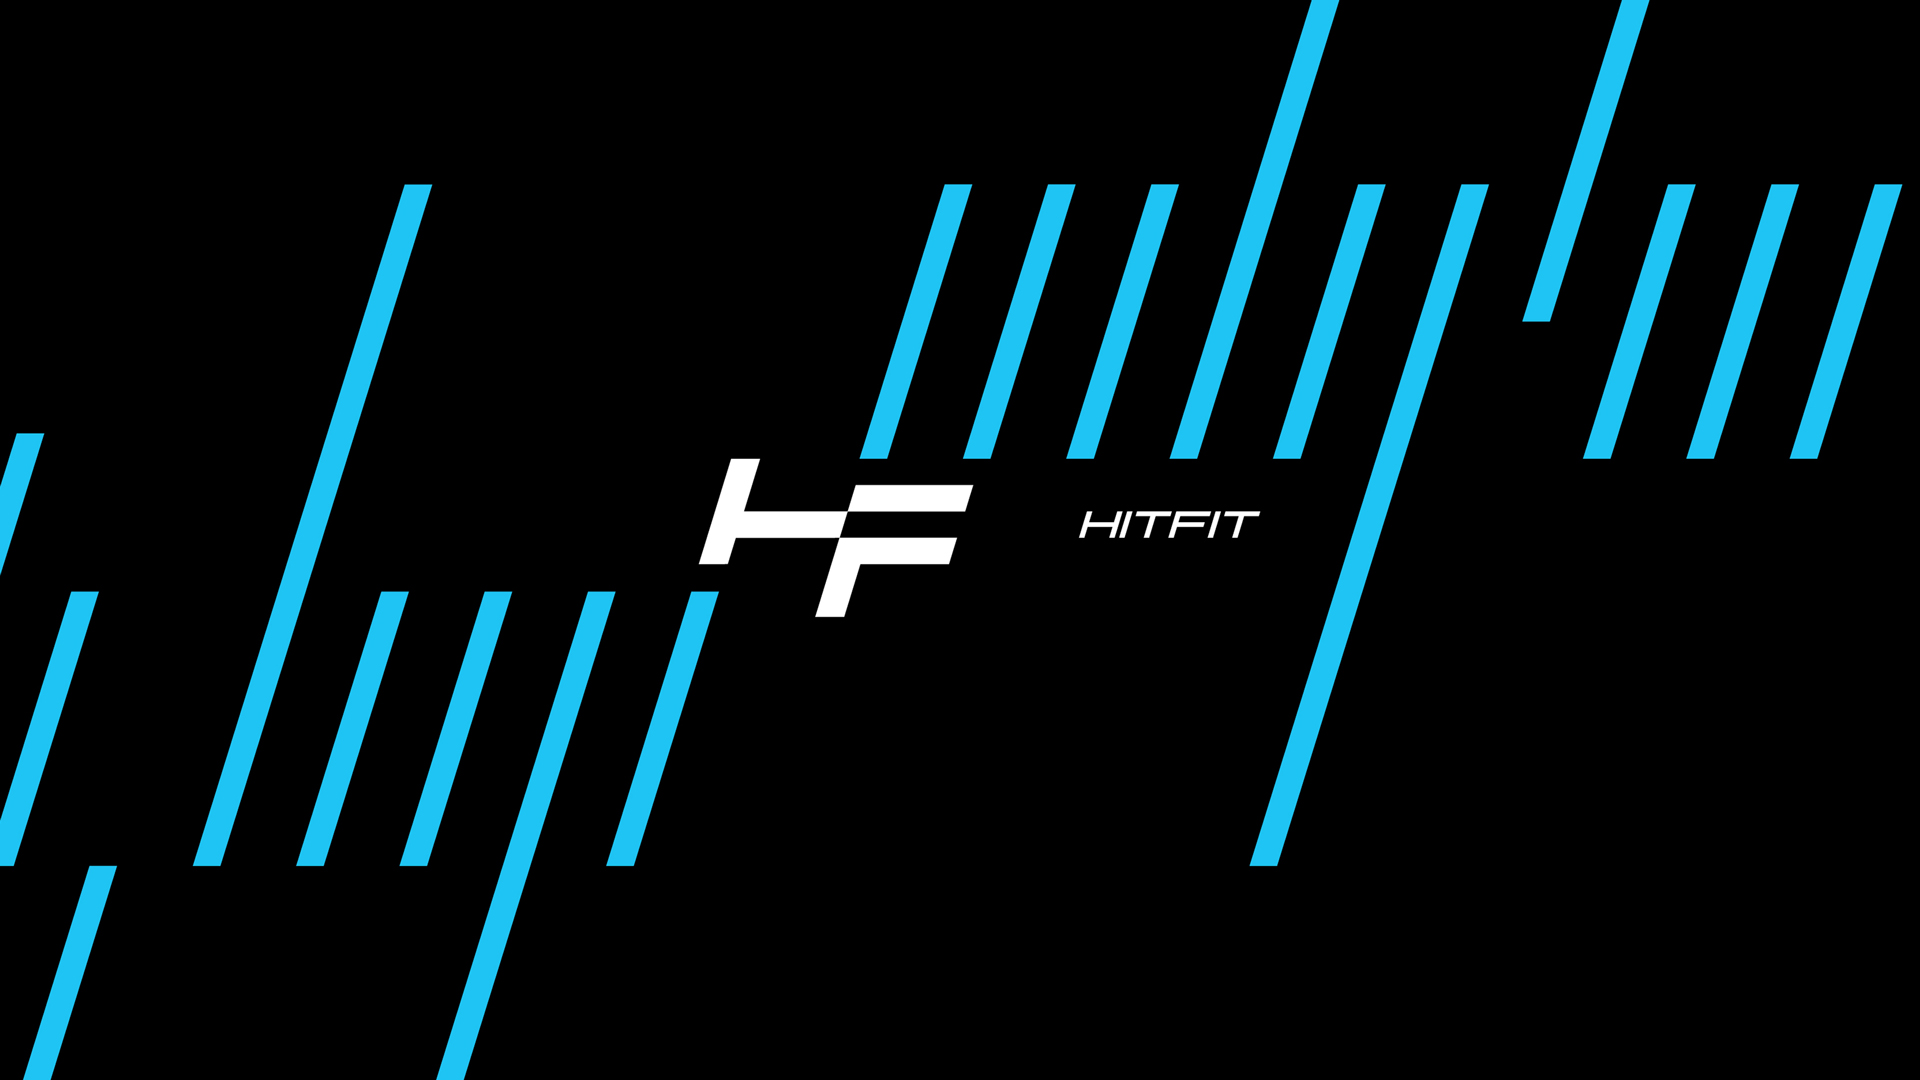 HitFit_hero2